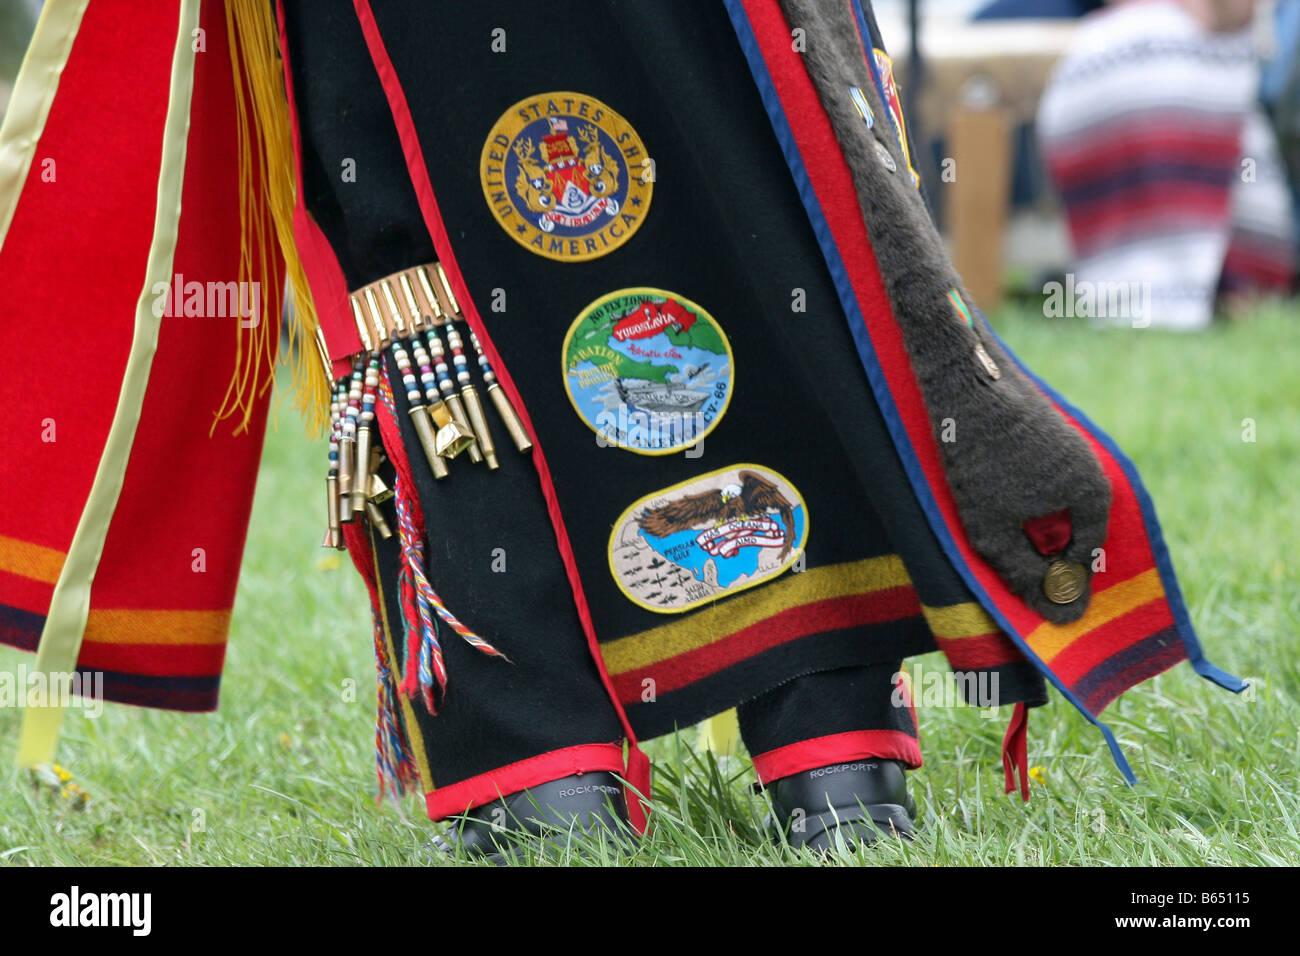 A Native American sports U.S. military badges sewn onto his traditional regalia. Stock Photo